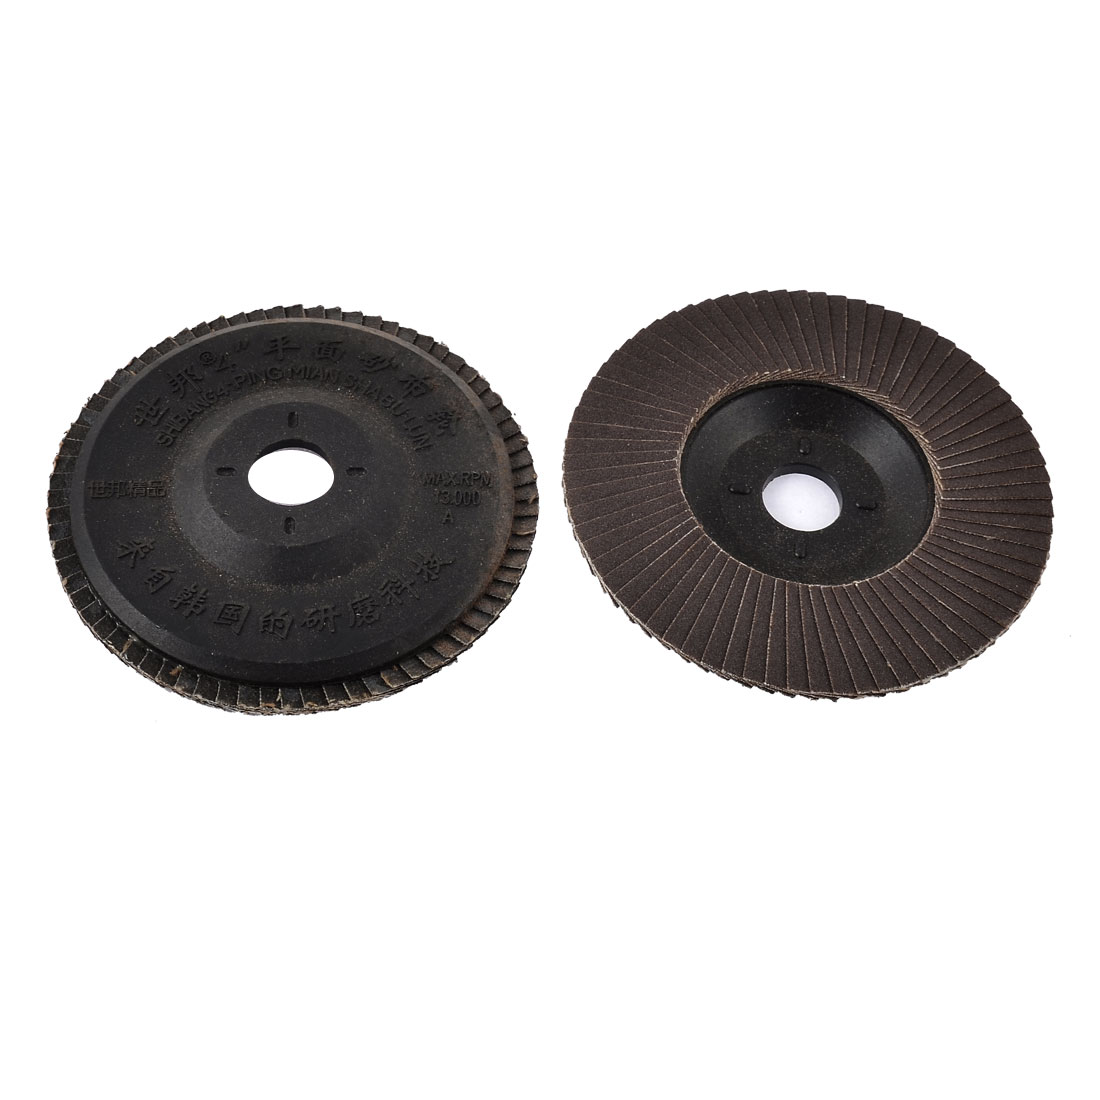 2pcs 180# Grit 100mm OD Round Flap Sanding Buffing Disc Abrasive Grinding Wheel